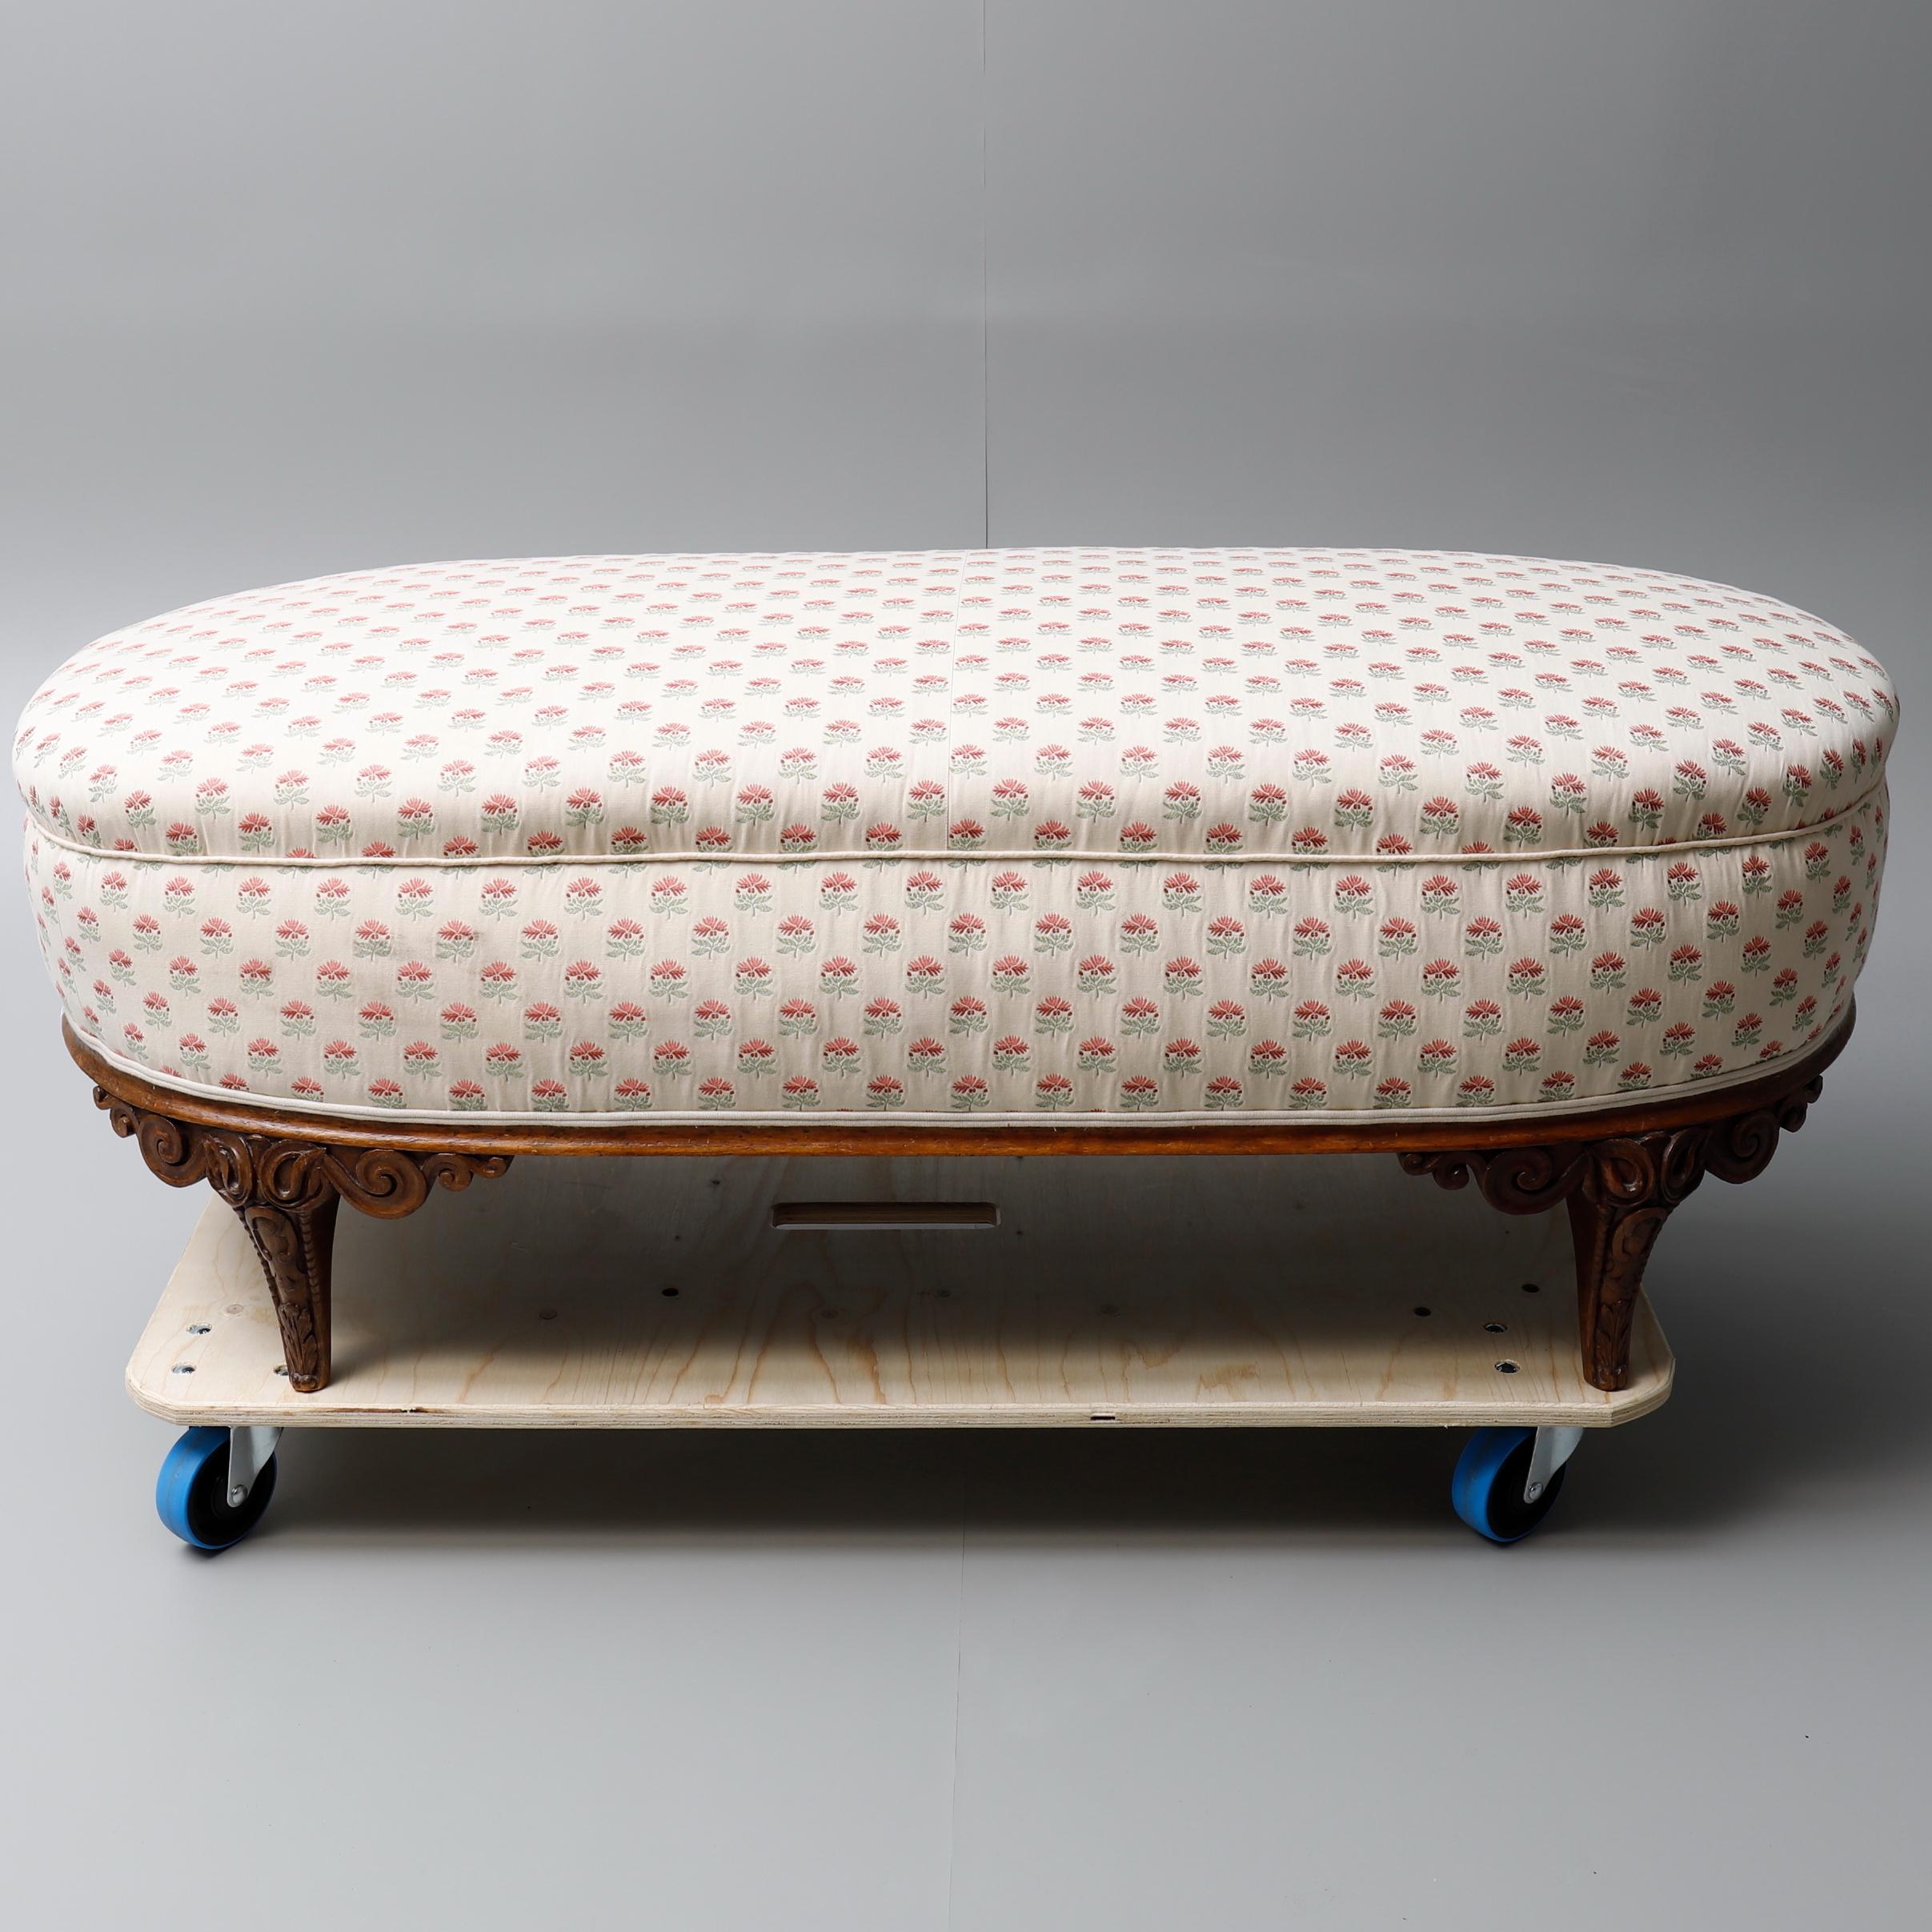 A WALNUT & UPHOLSTERED OTTOMAN. Möbel - Sofas & Sitzgruppen - Auctionet